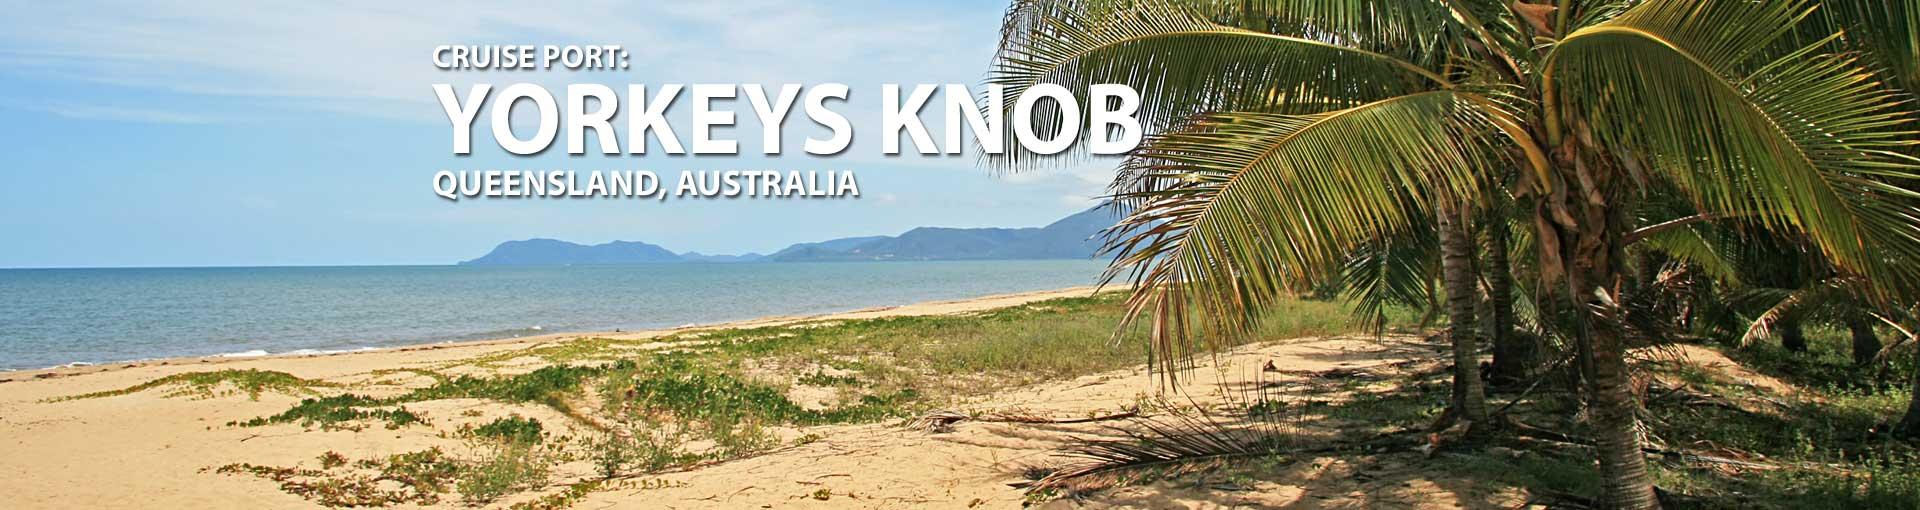 Cruises to Yorkeys Knob